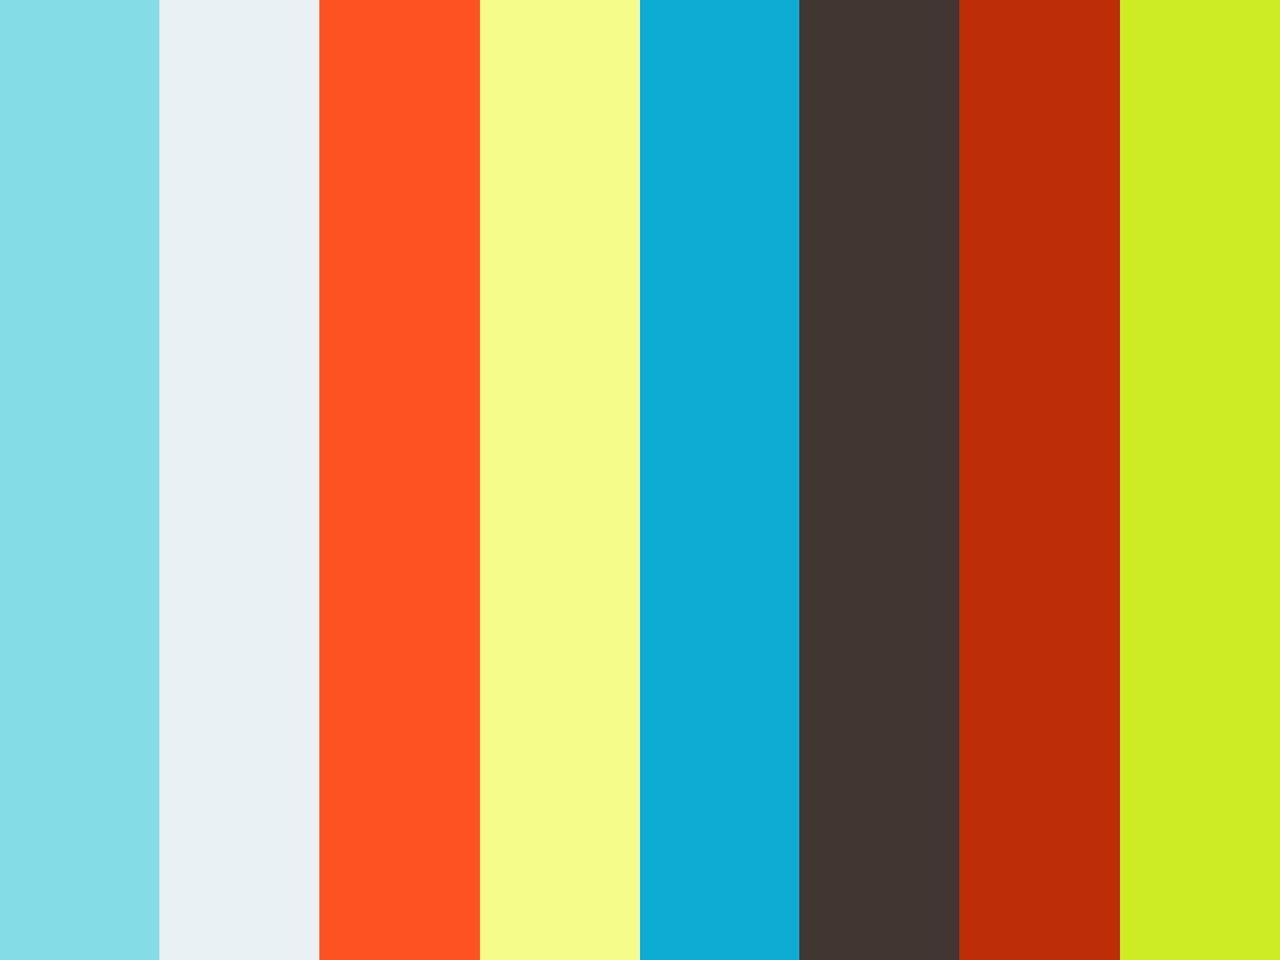 Color Grading - Demo Reel